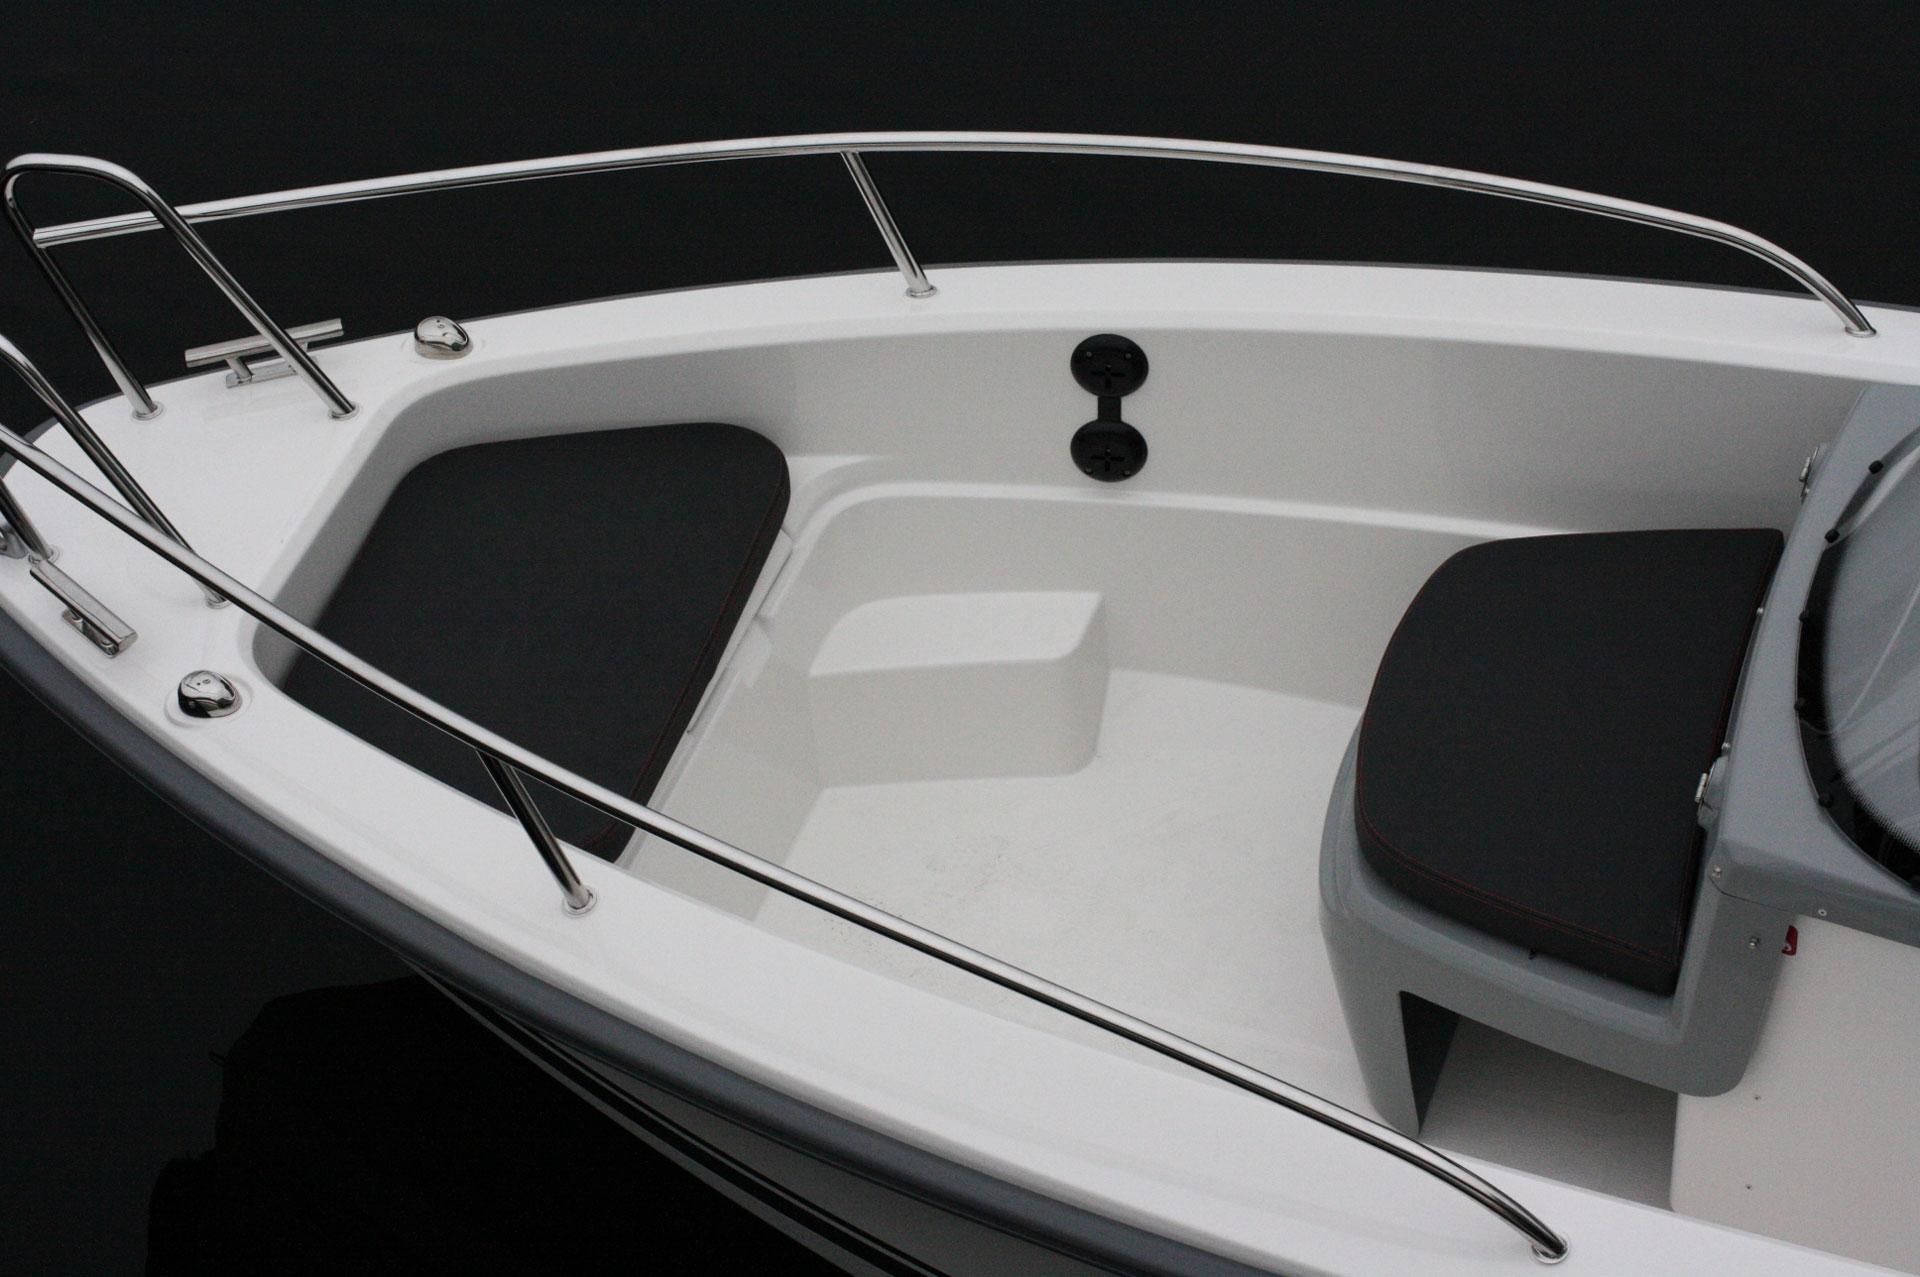 prisvärdbåt-ryds